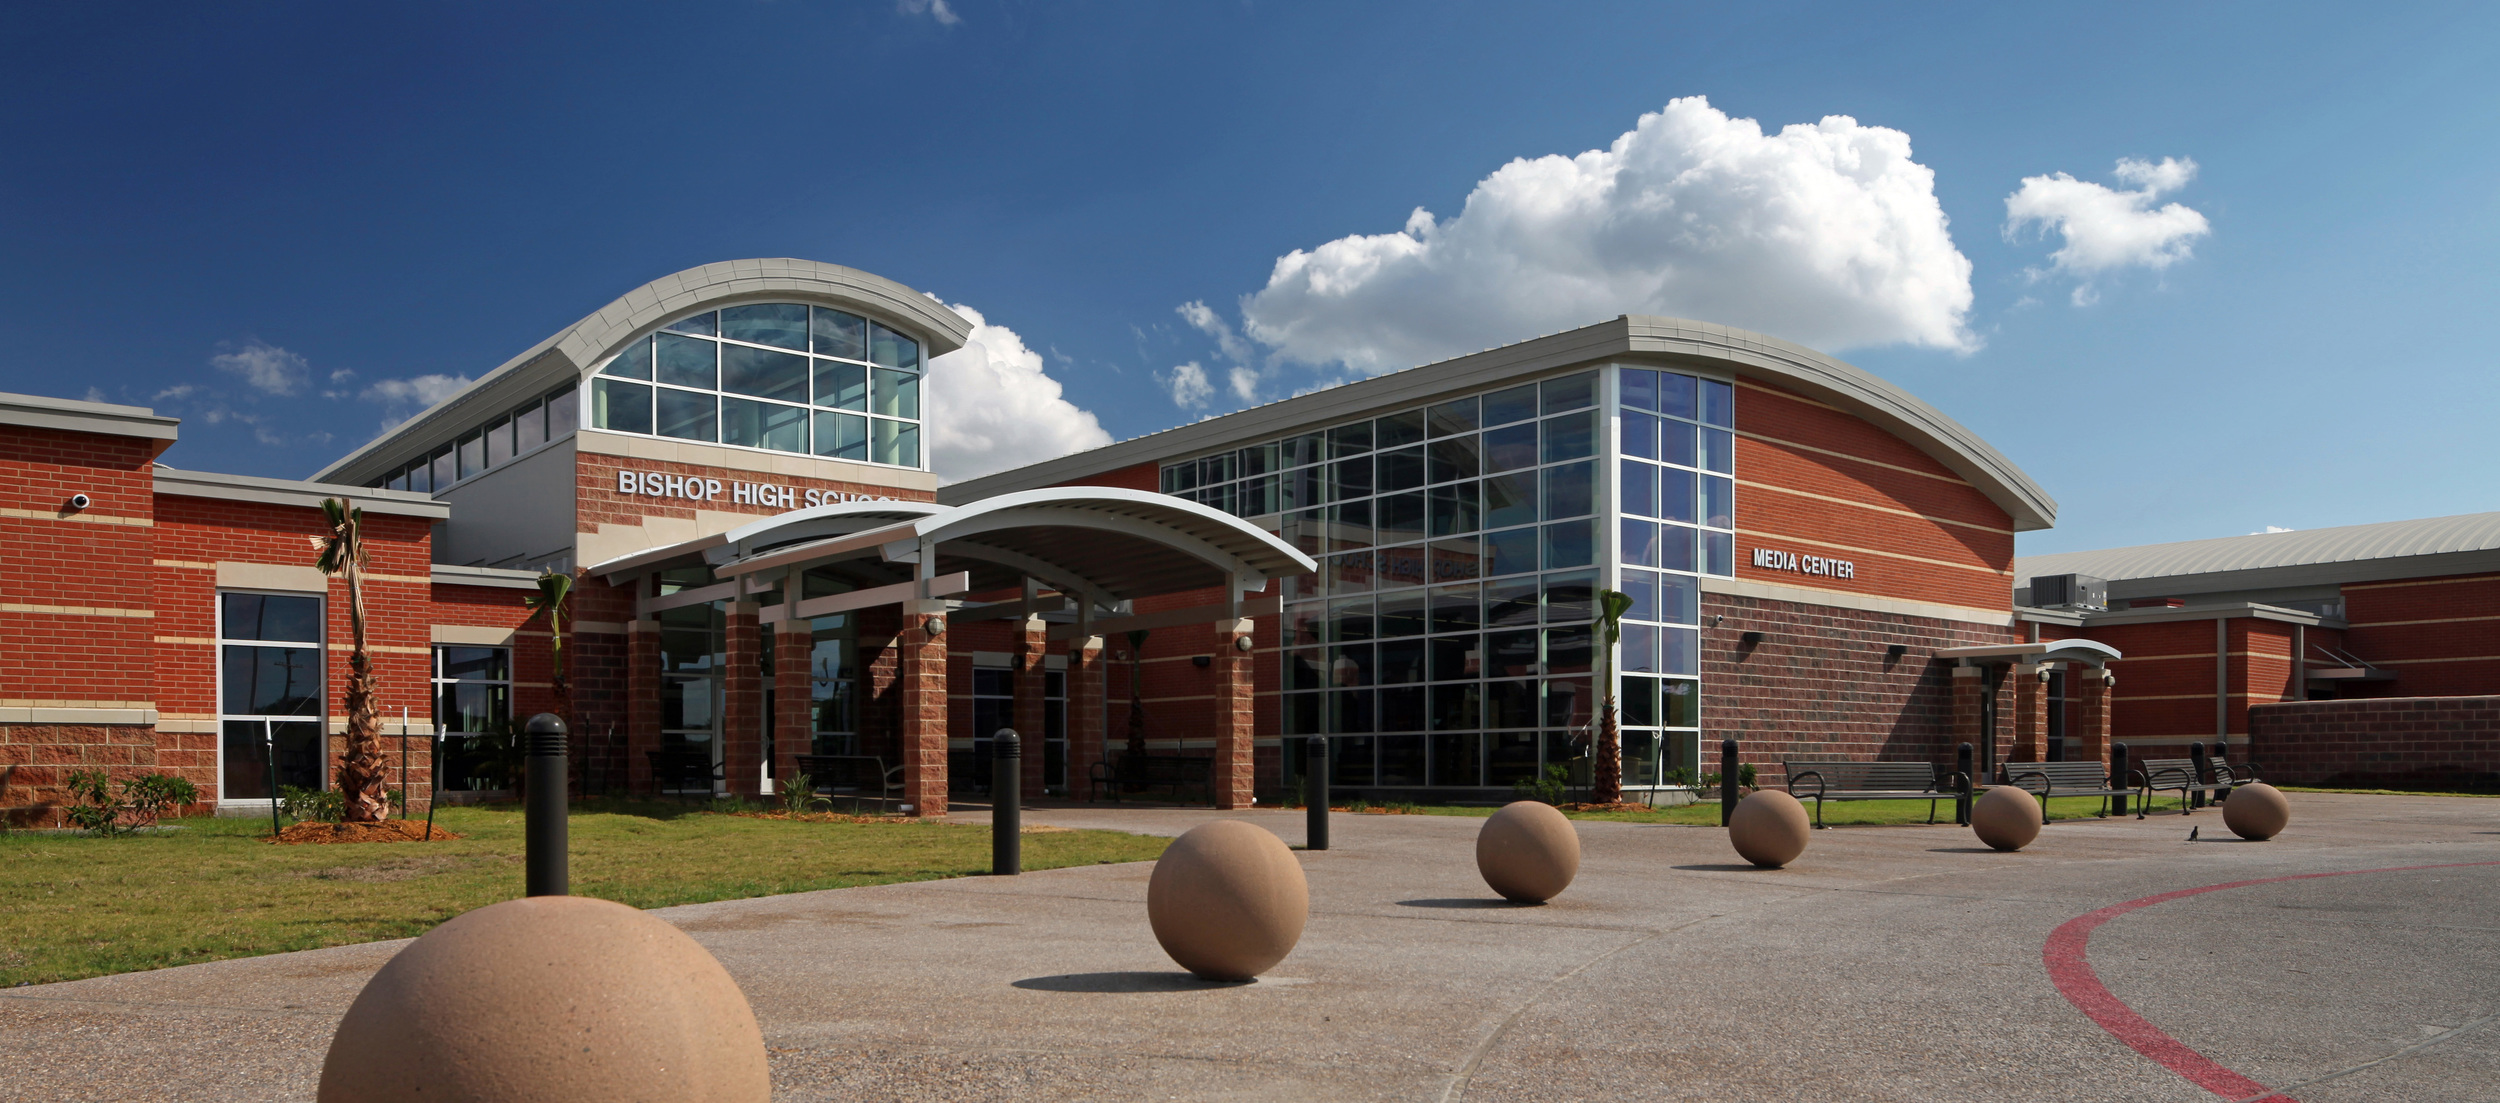 Bishop High School